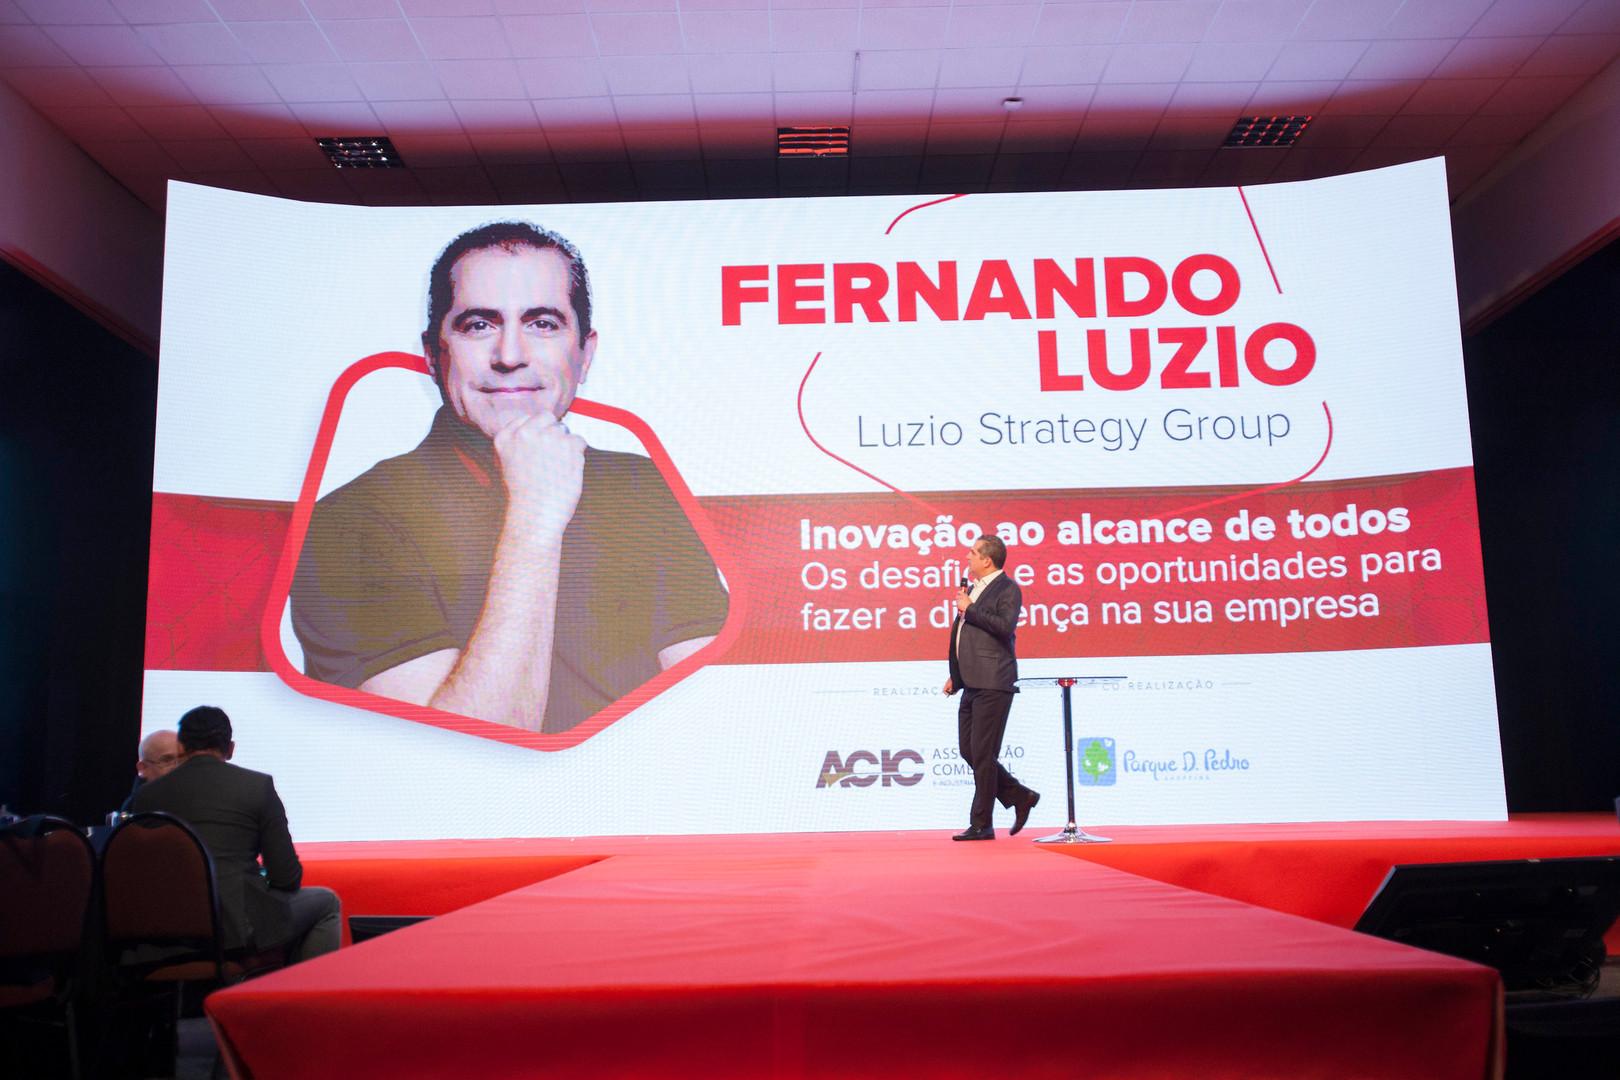 Fernando Luzio